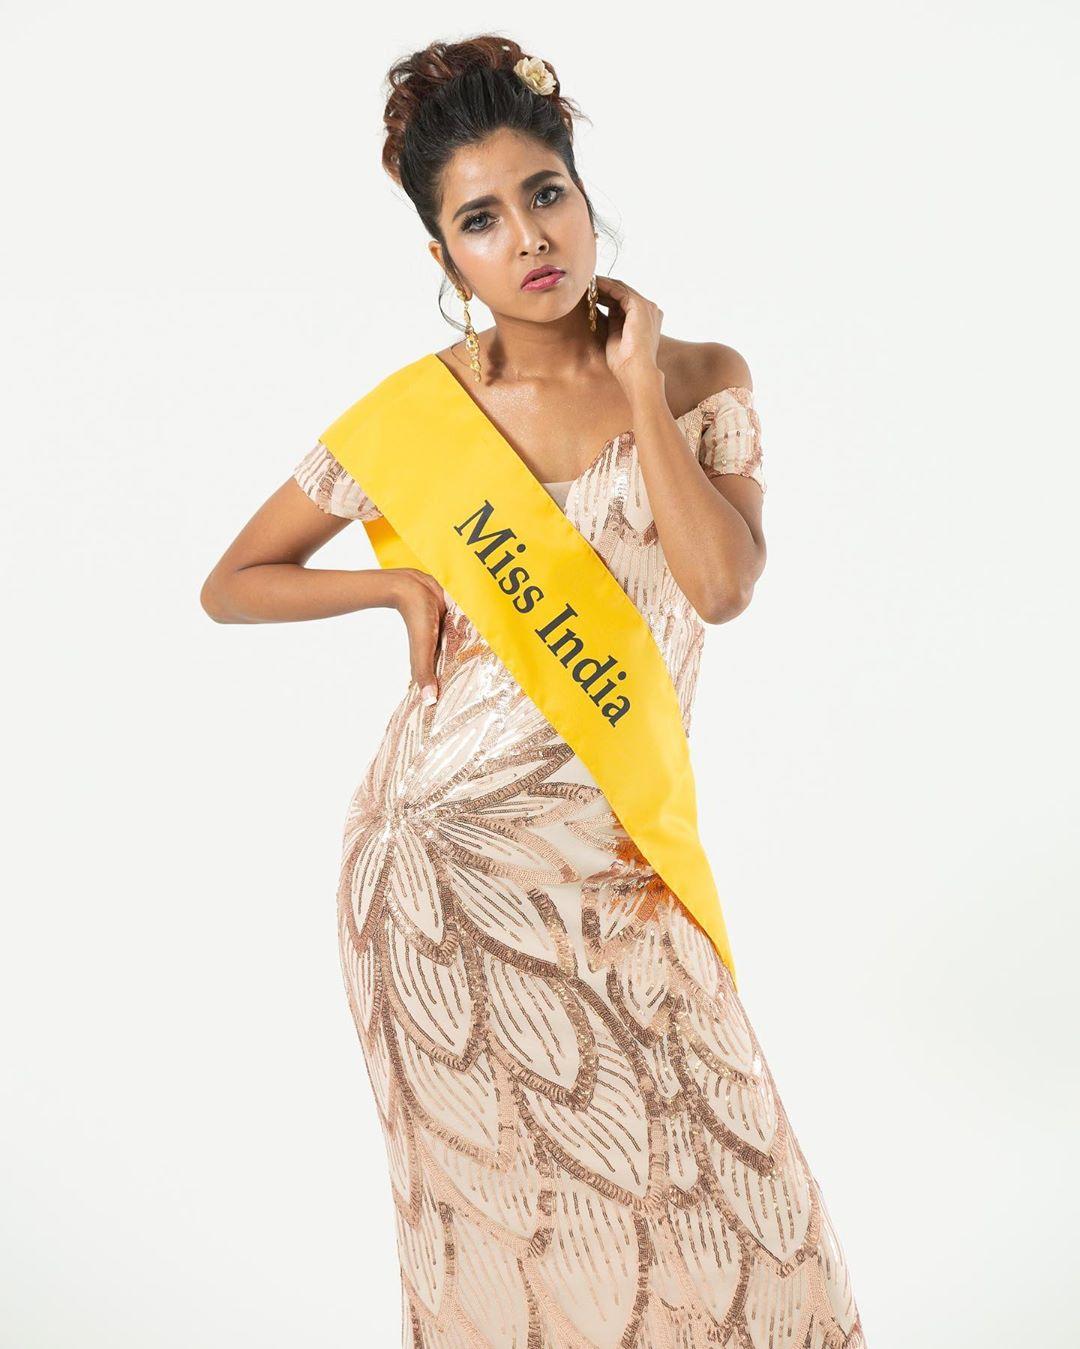 miss latvia vence miss great 2019. 1kOT12